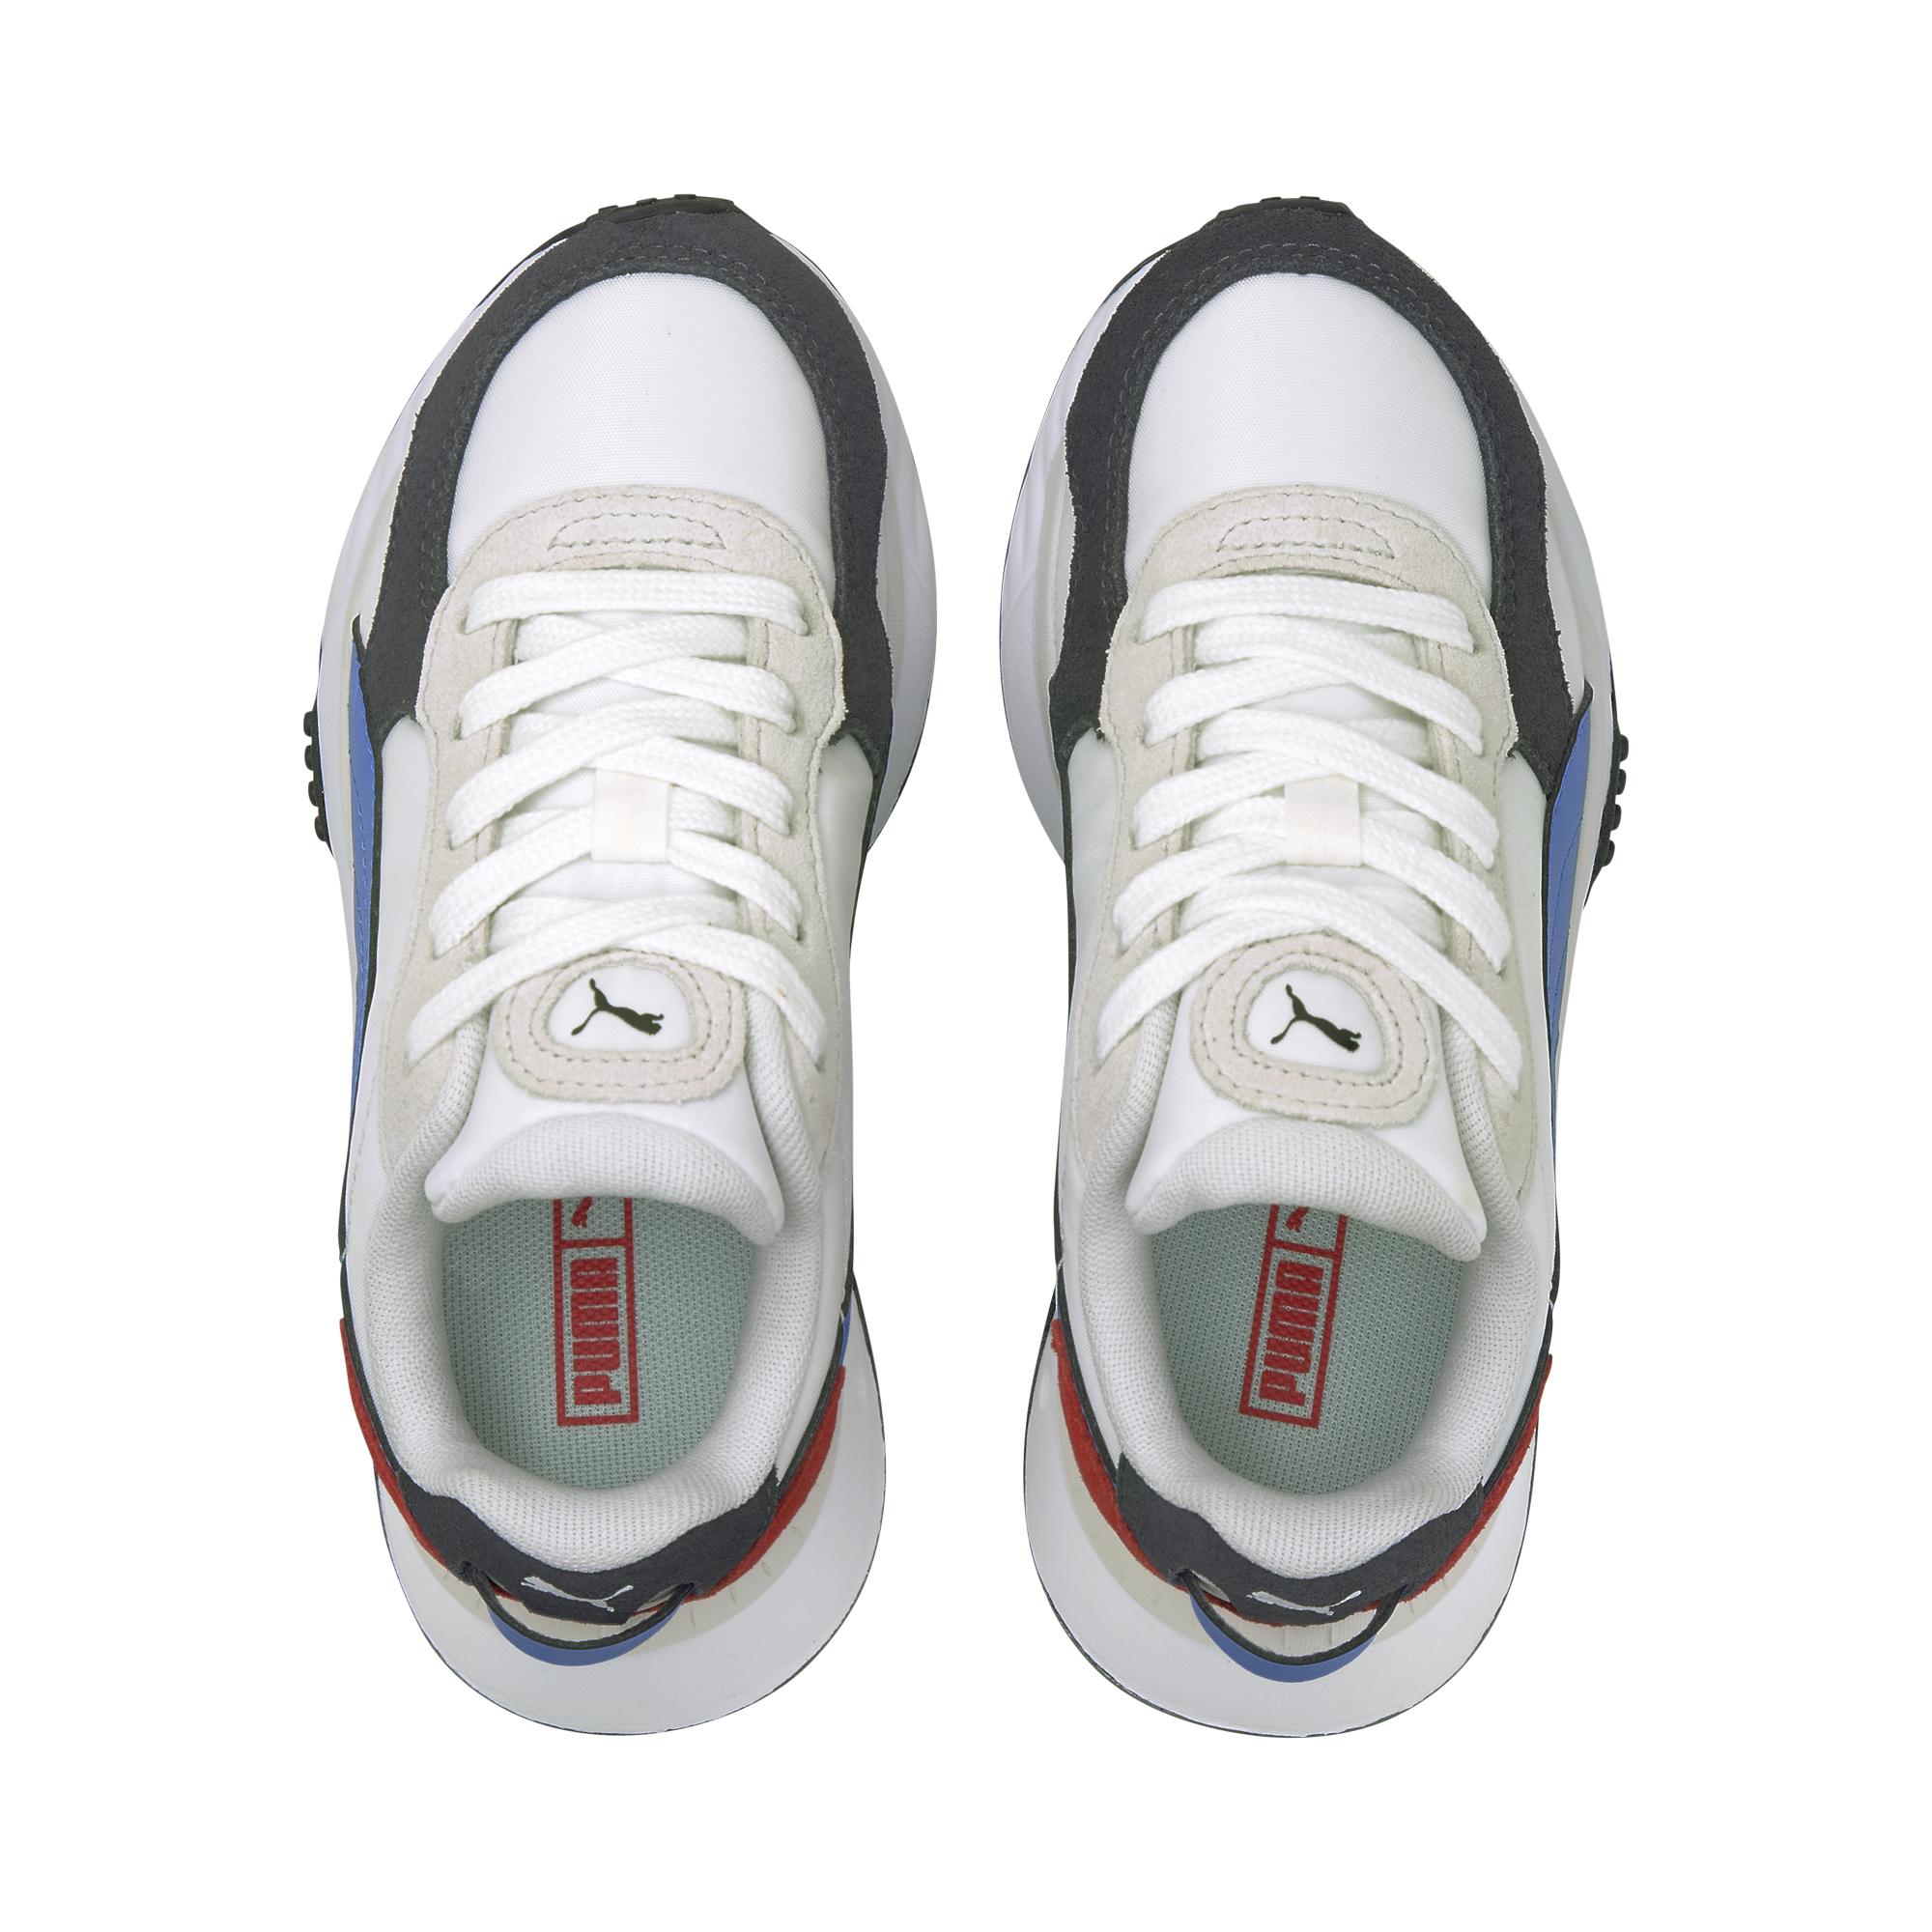 Puma Wild Rider Rollin' PS Sneakers, Ebony, 34